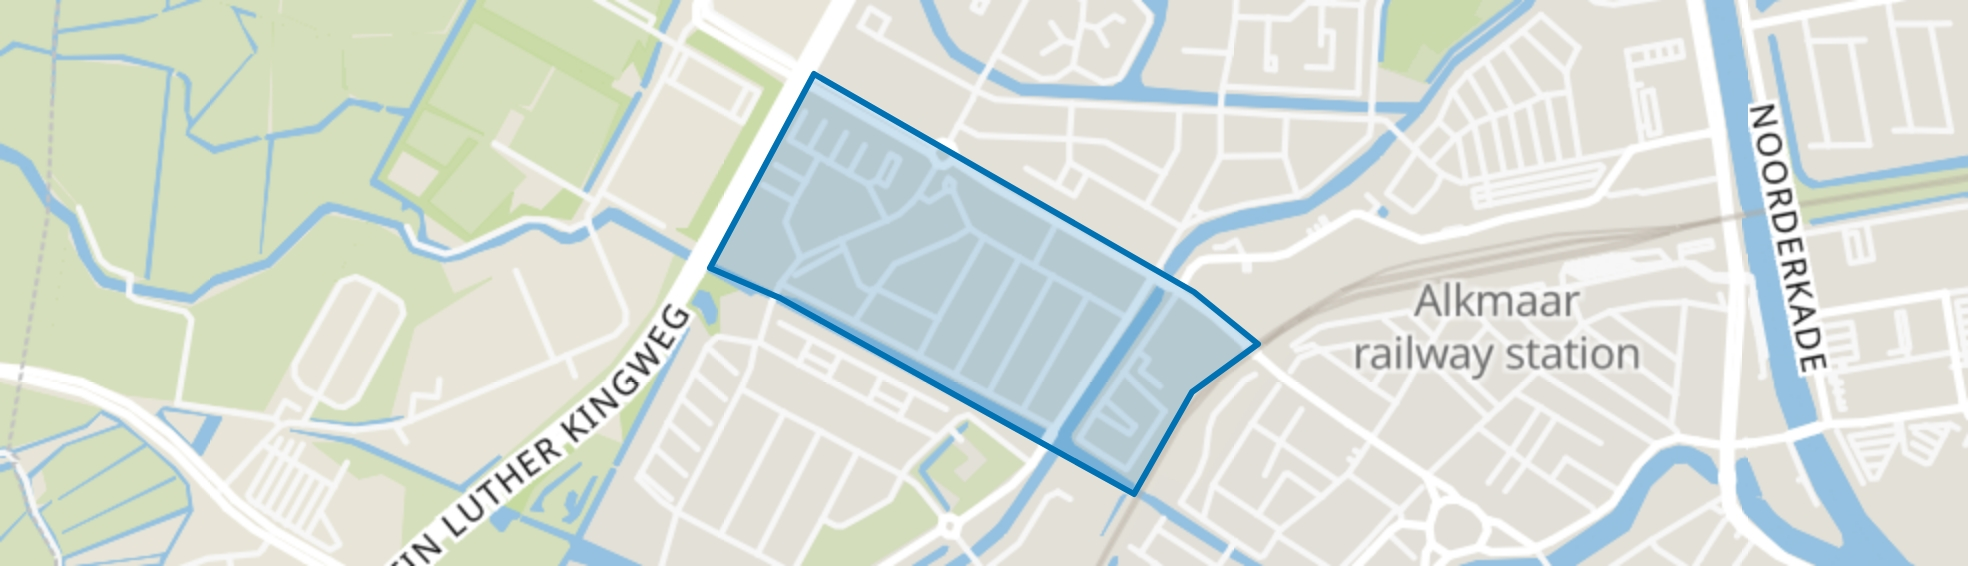 Bergerwegkwartier, Alkmaar map